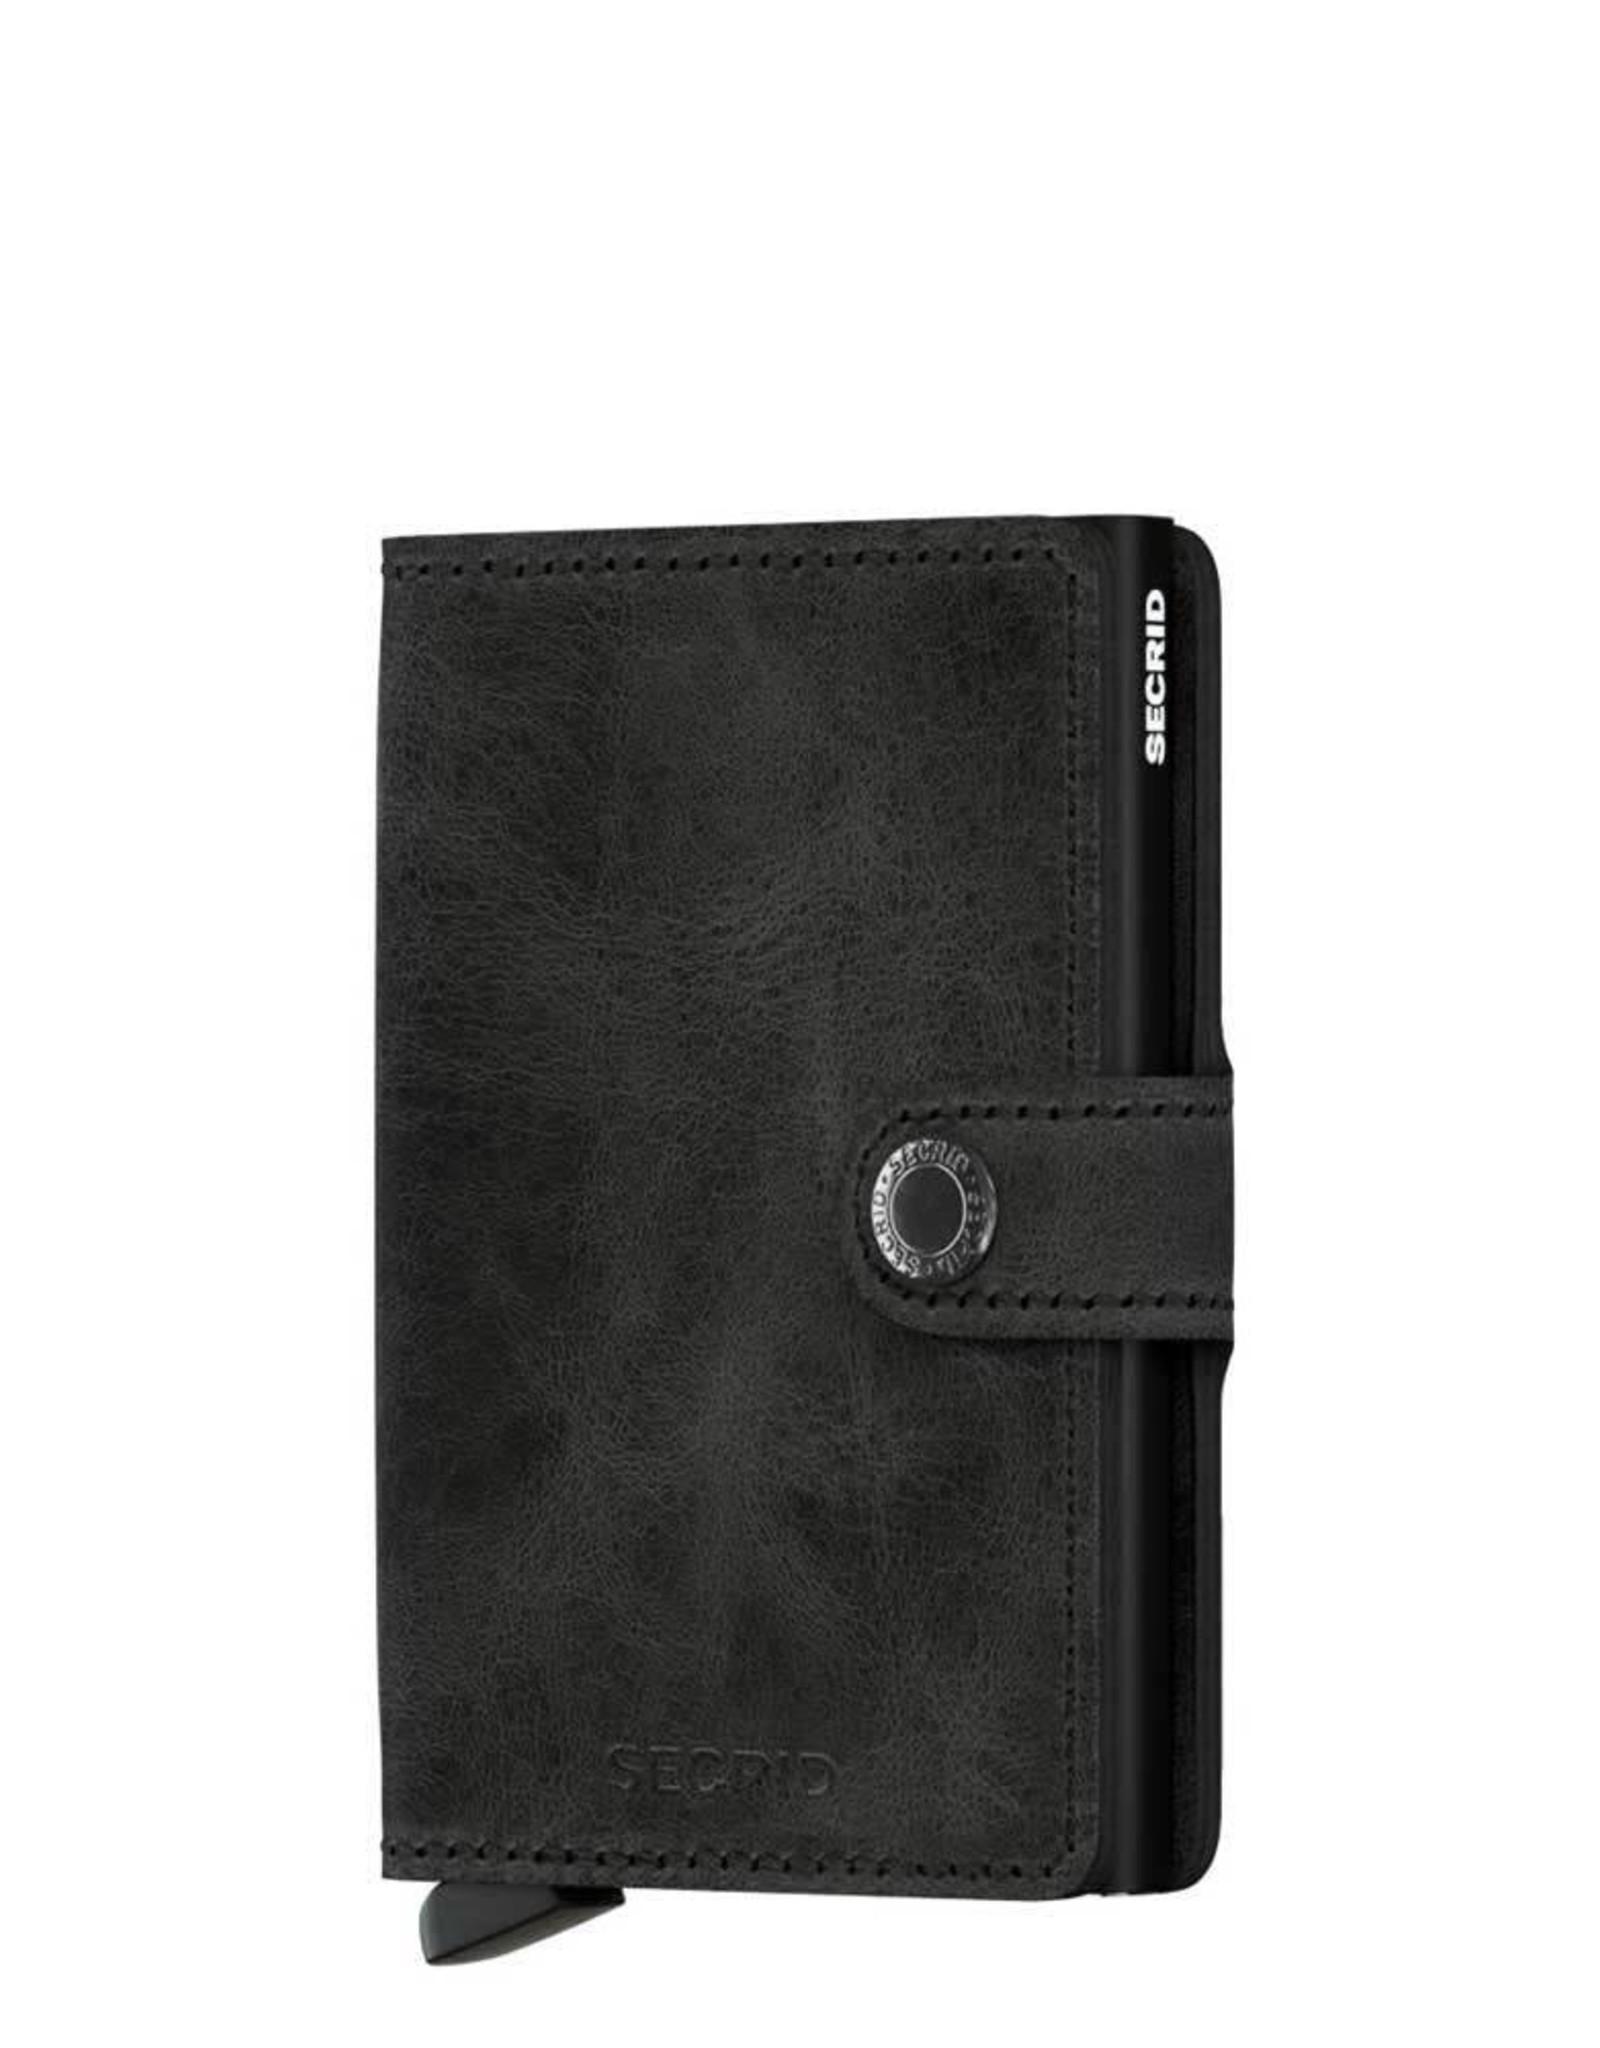 Secrid Secrid - MW- Vintage black